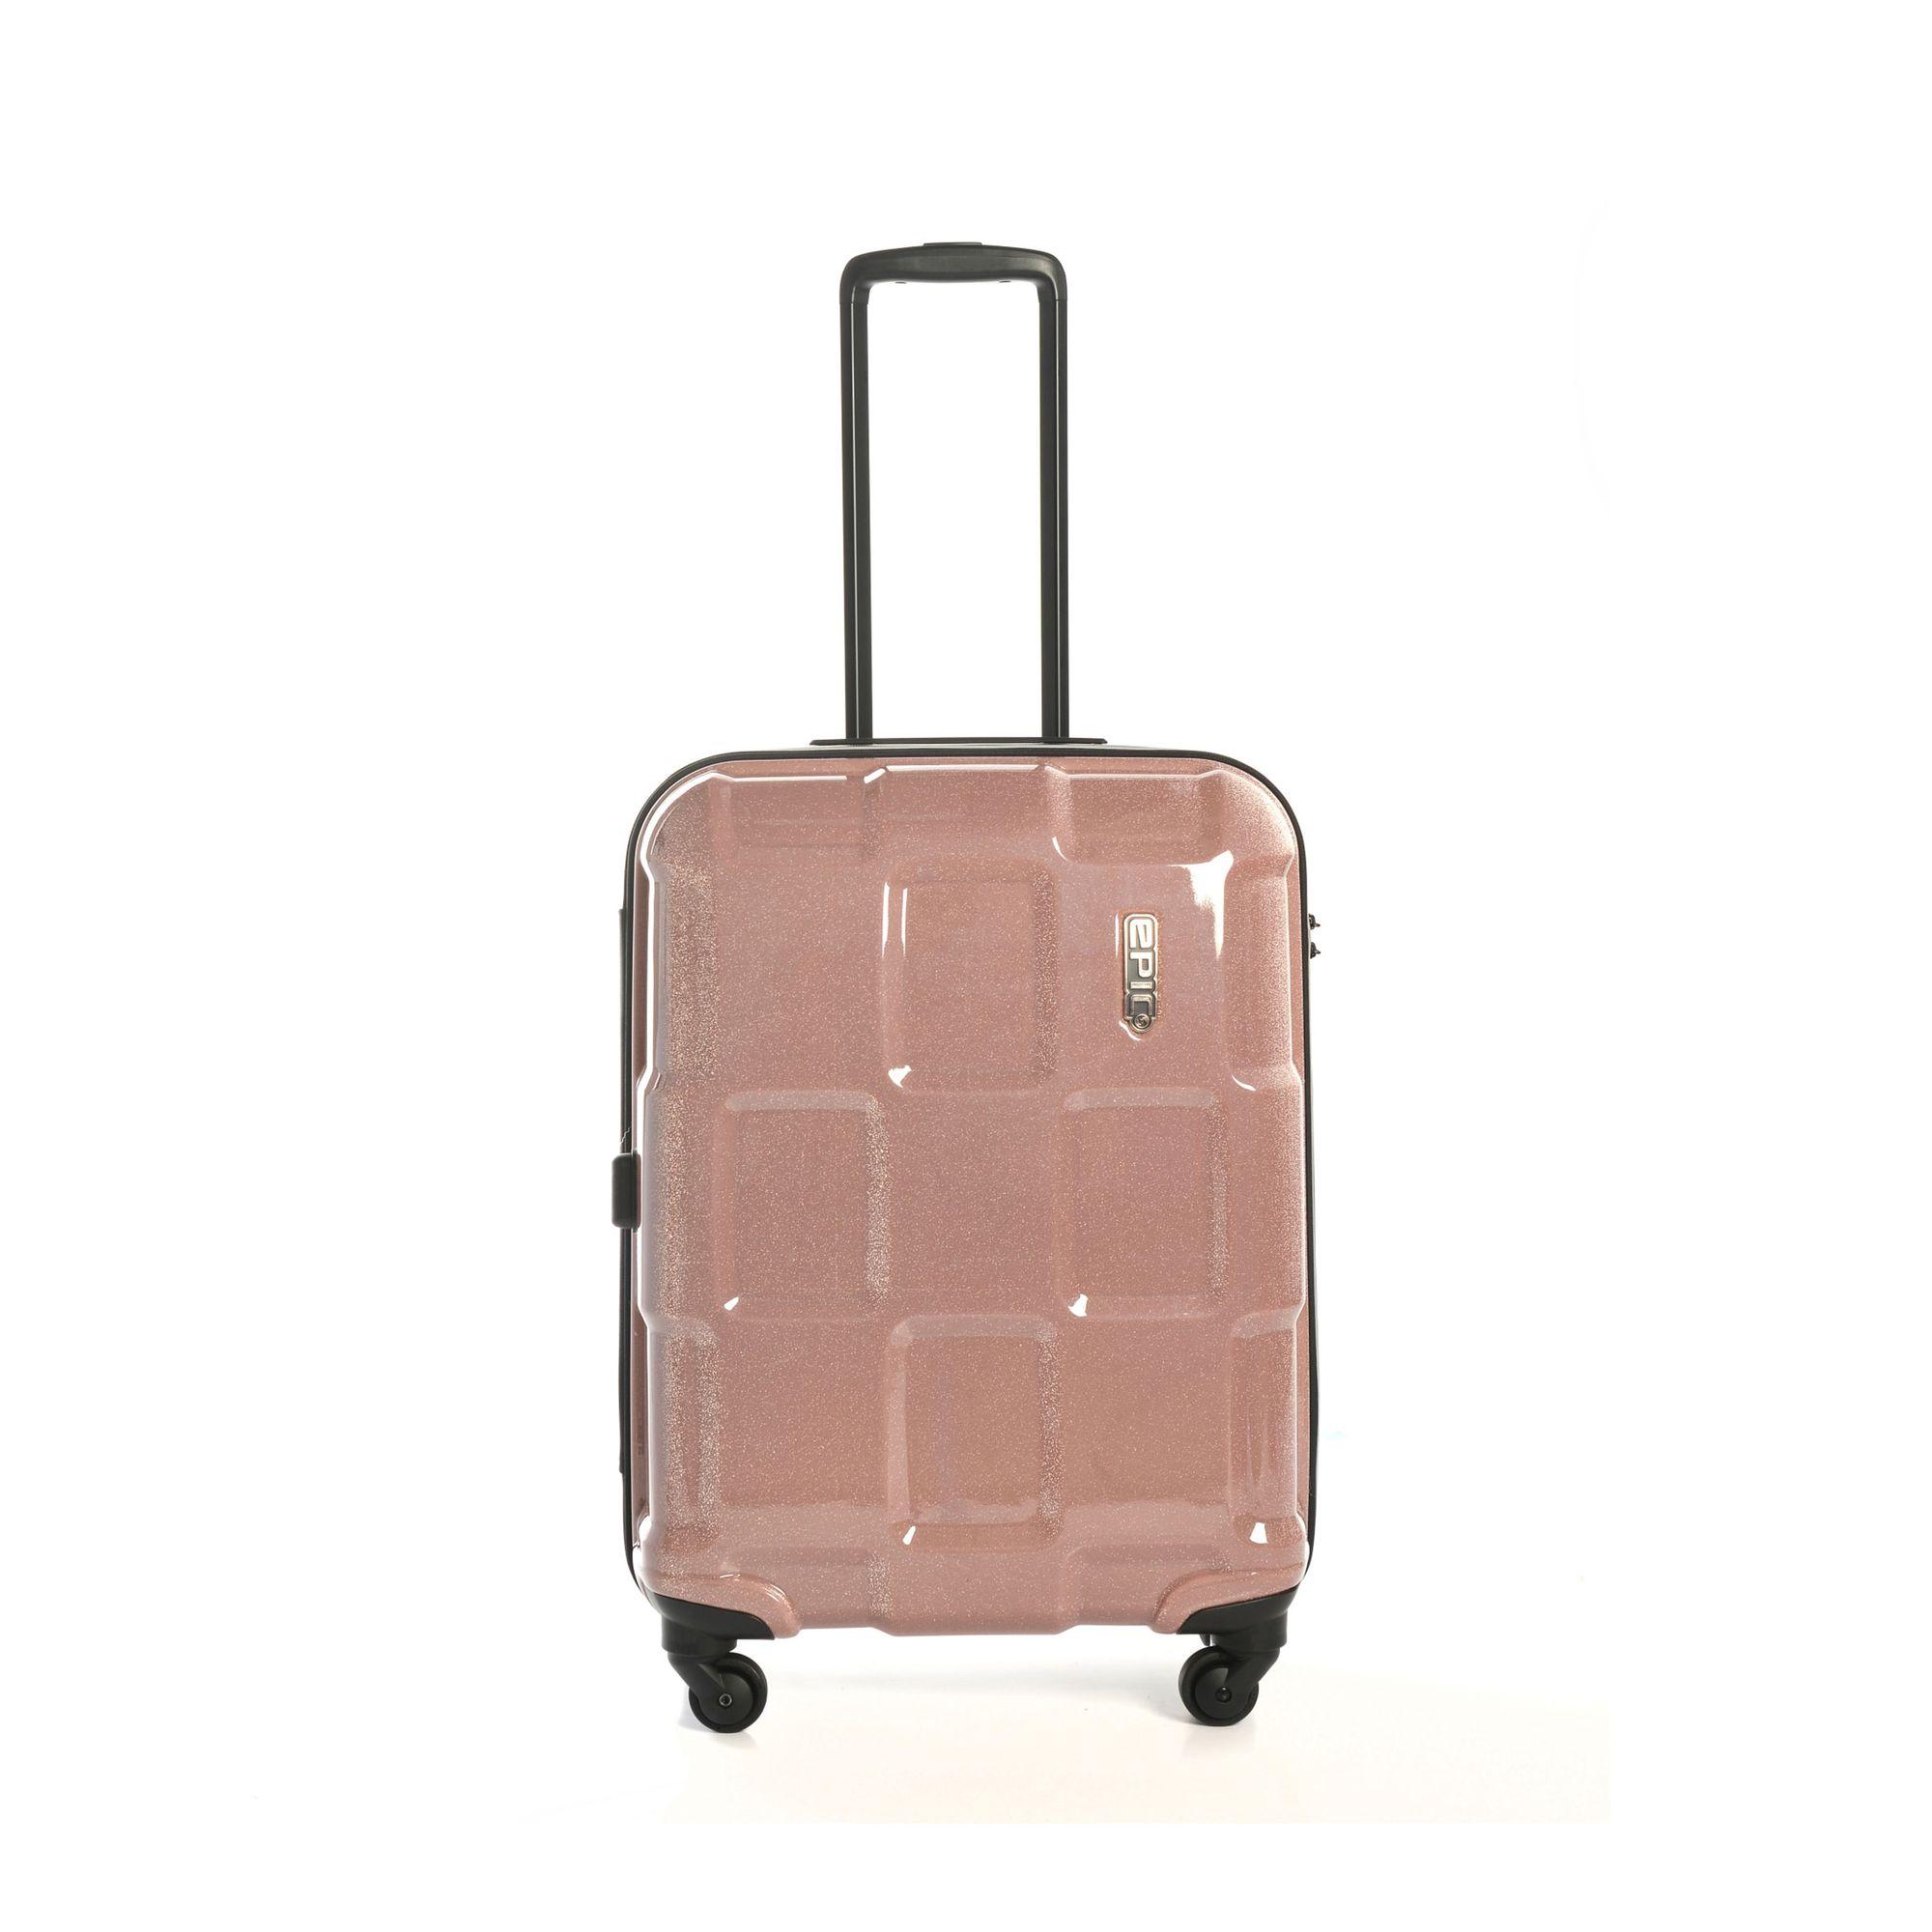 EPIC Crate Reflex hård resväska, 4 hjul, 55/66/76 cm, Rosa, 55cm